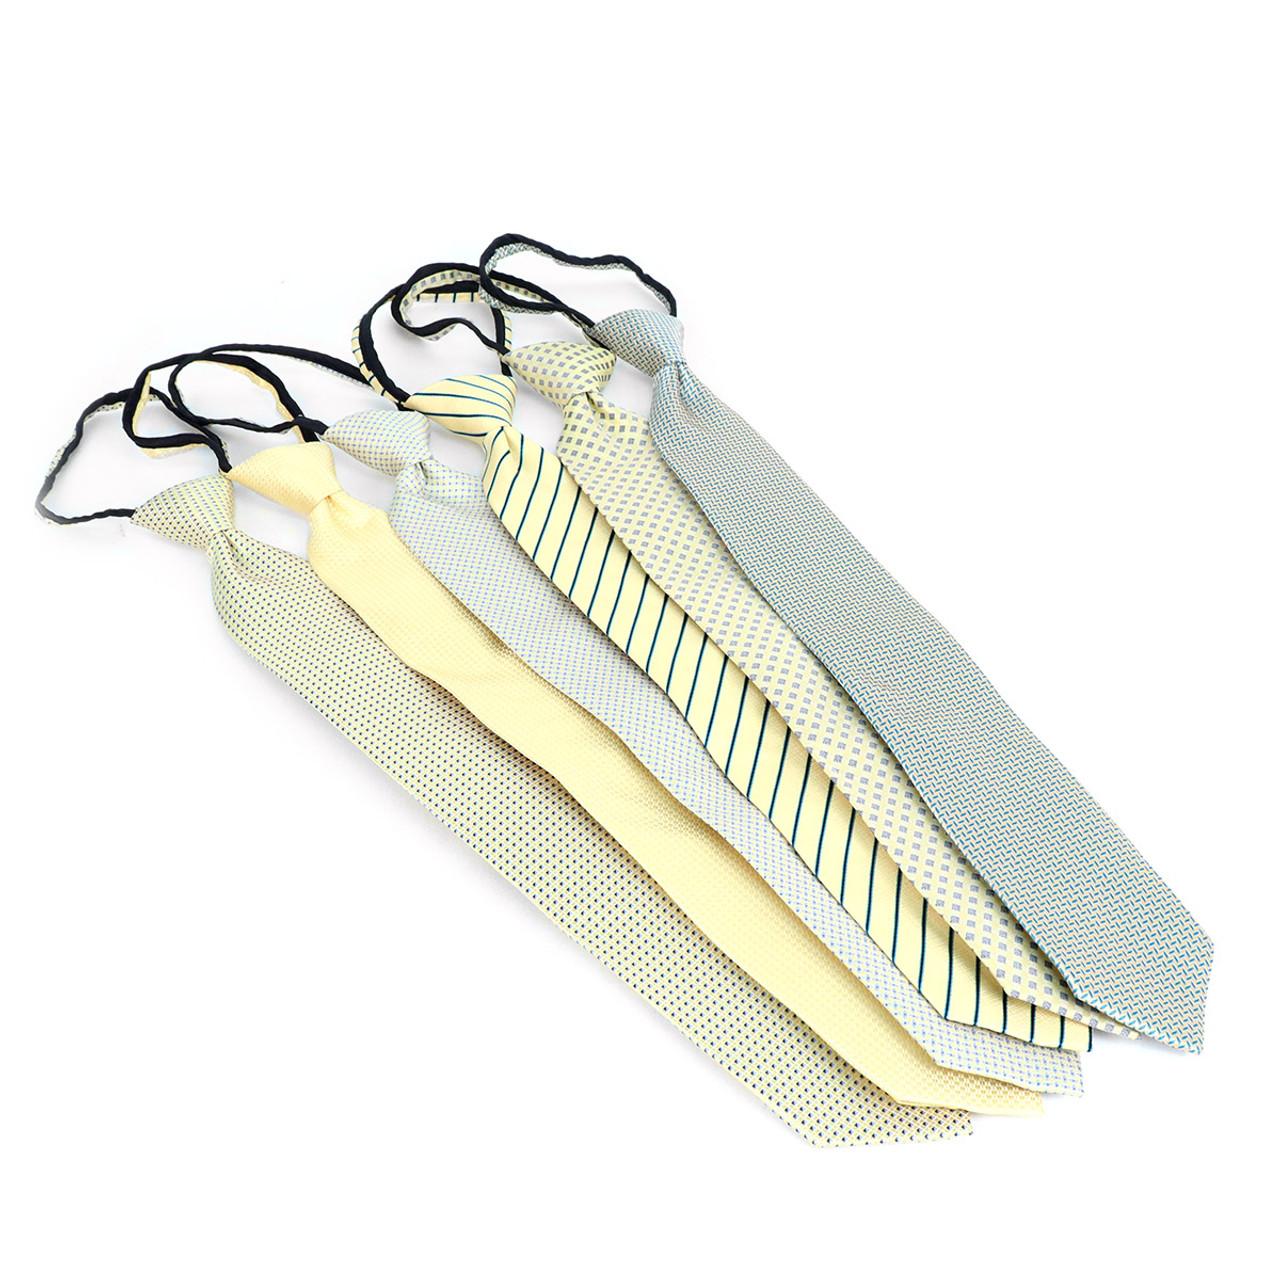 764c061a1a8a 6pc Microfiber Classic Yellow Zipper Pre-Tied Neckties - MPWZ-YW